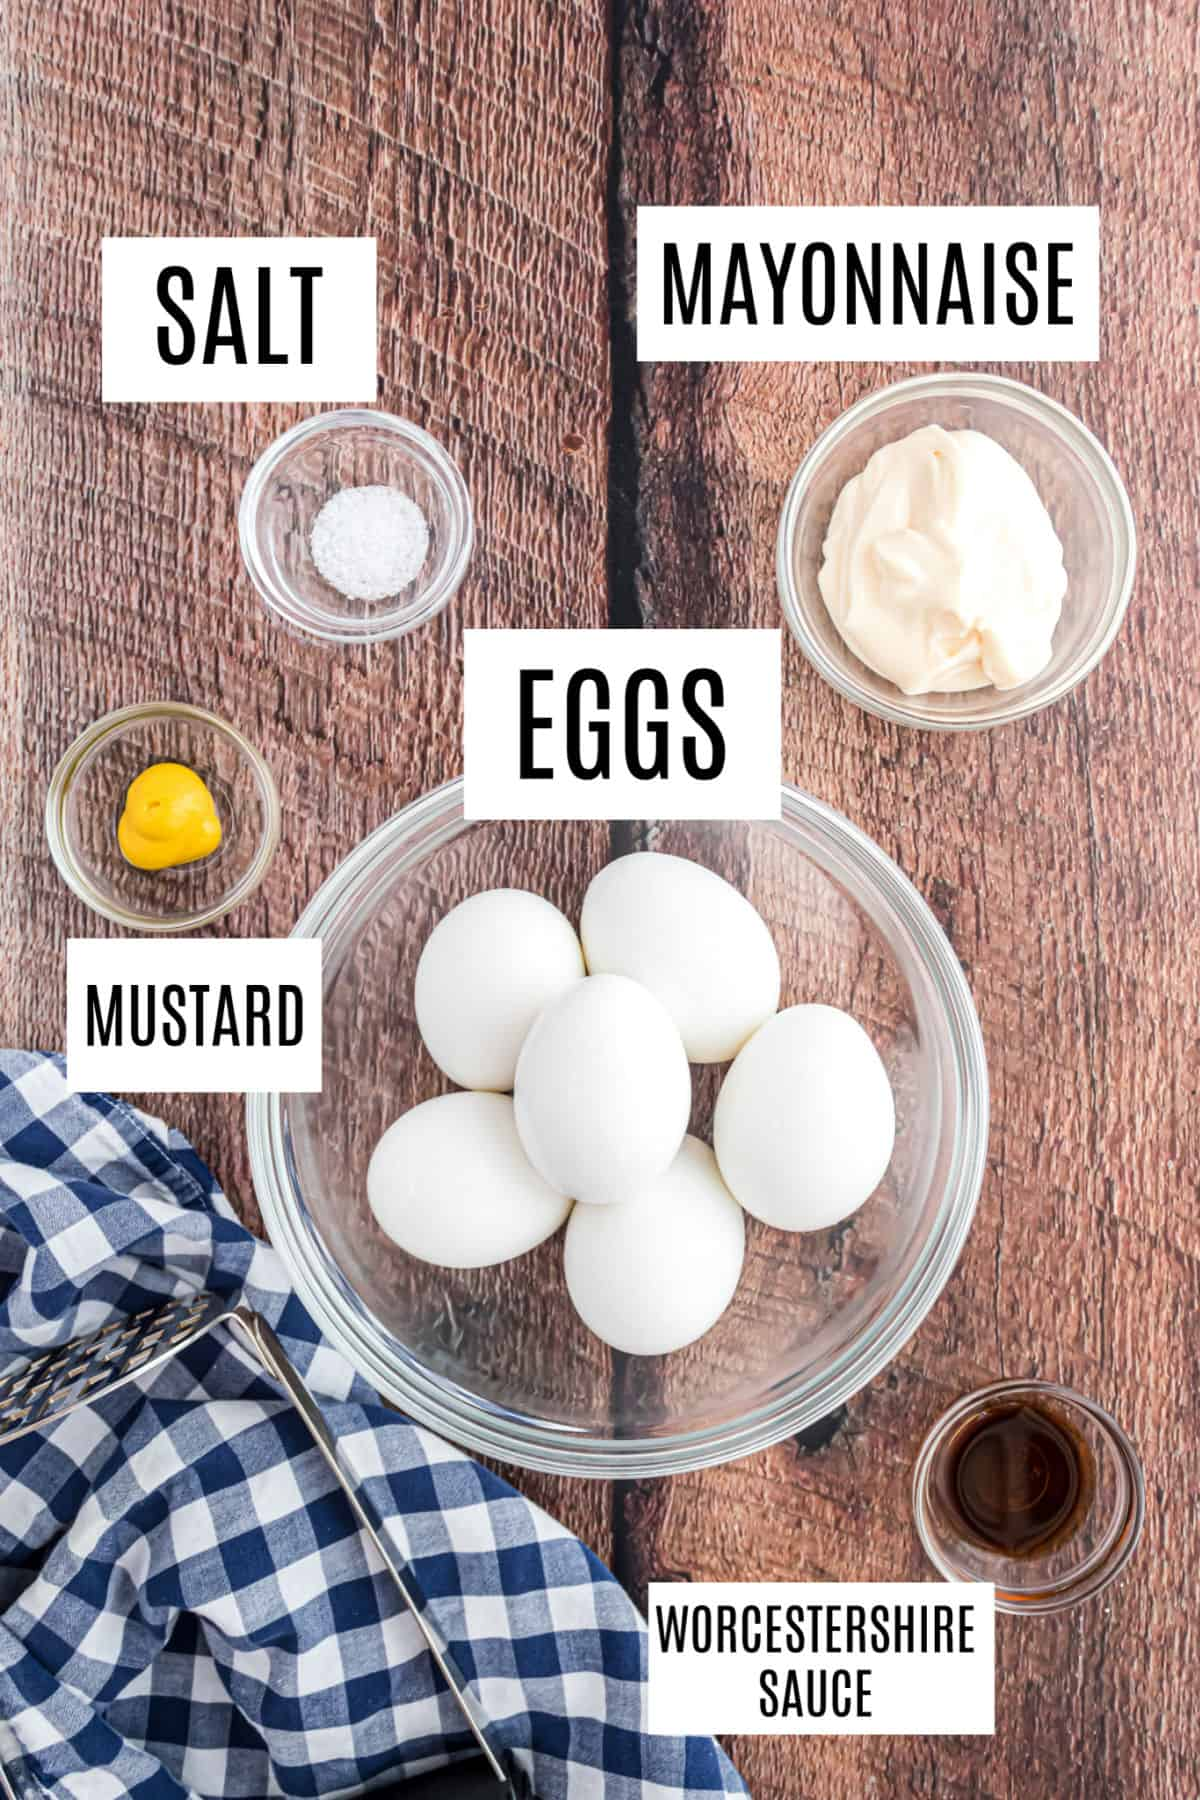 Only 5 ingredients for egg salad.